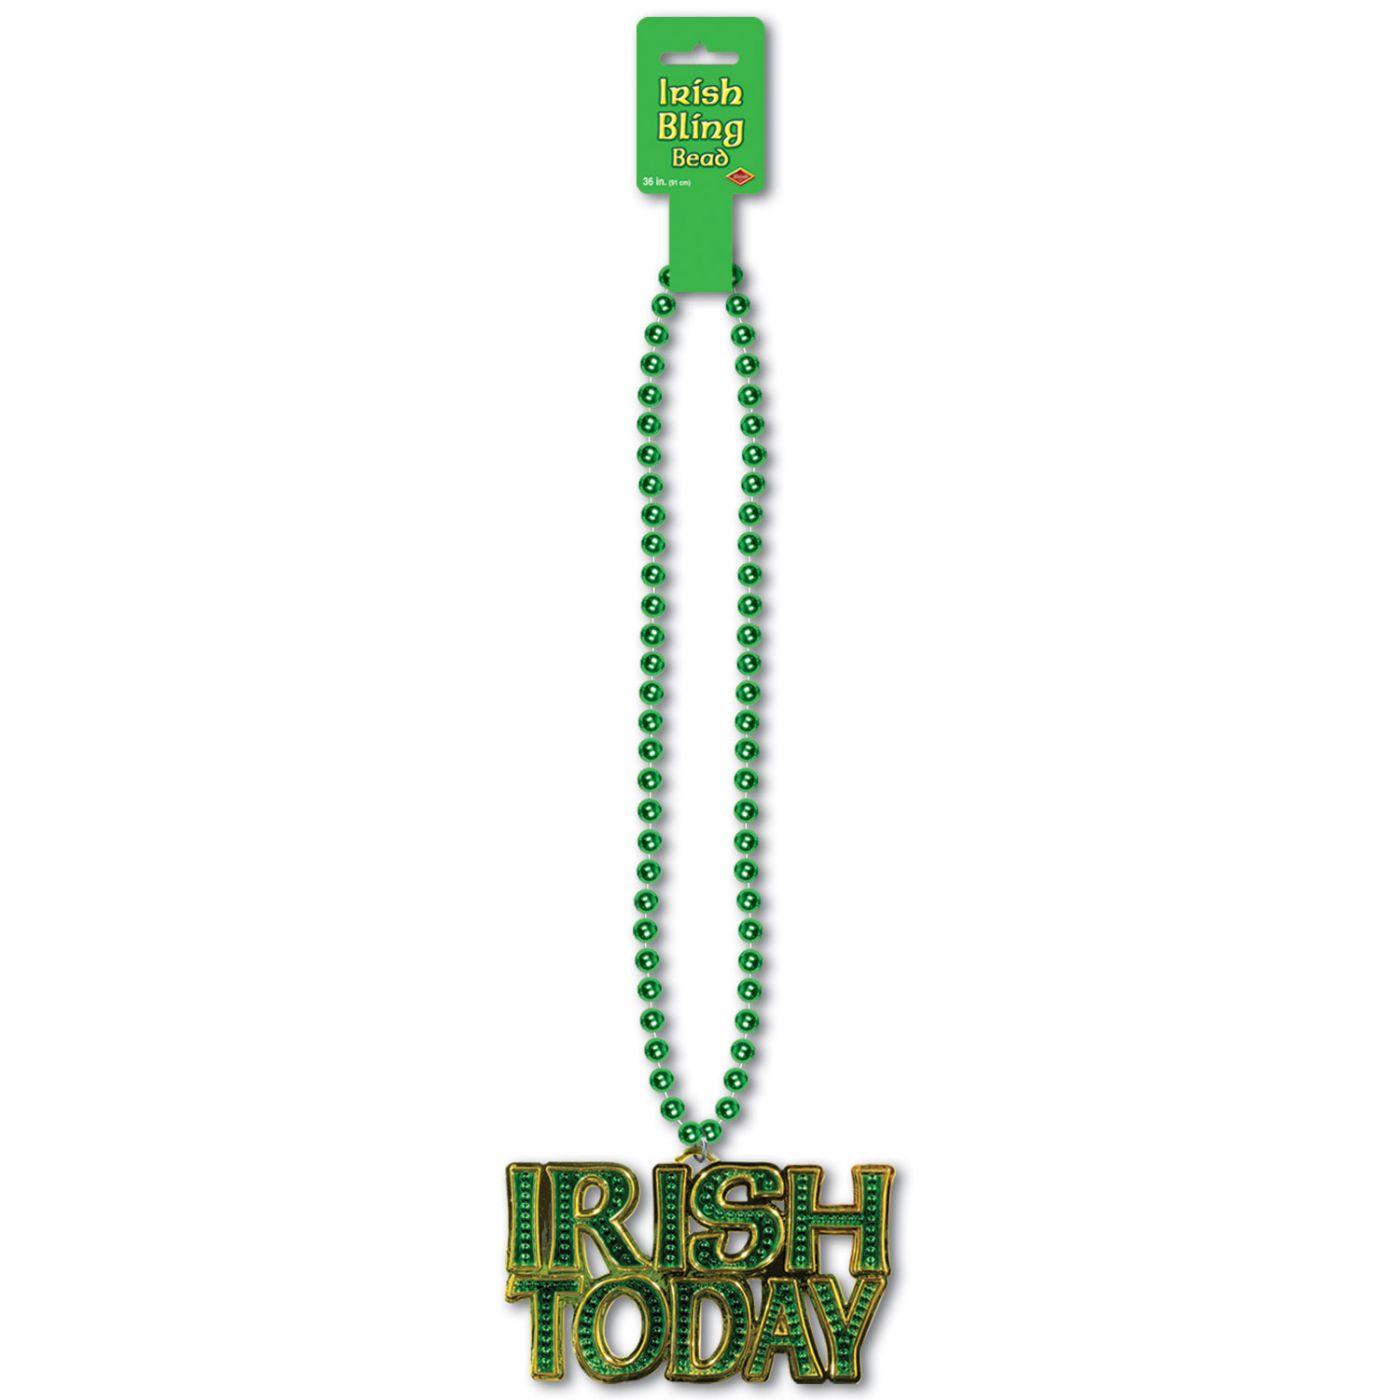 Image of Beads w/Irish Today Medallion